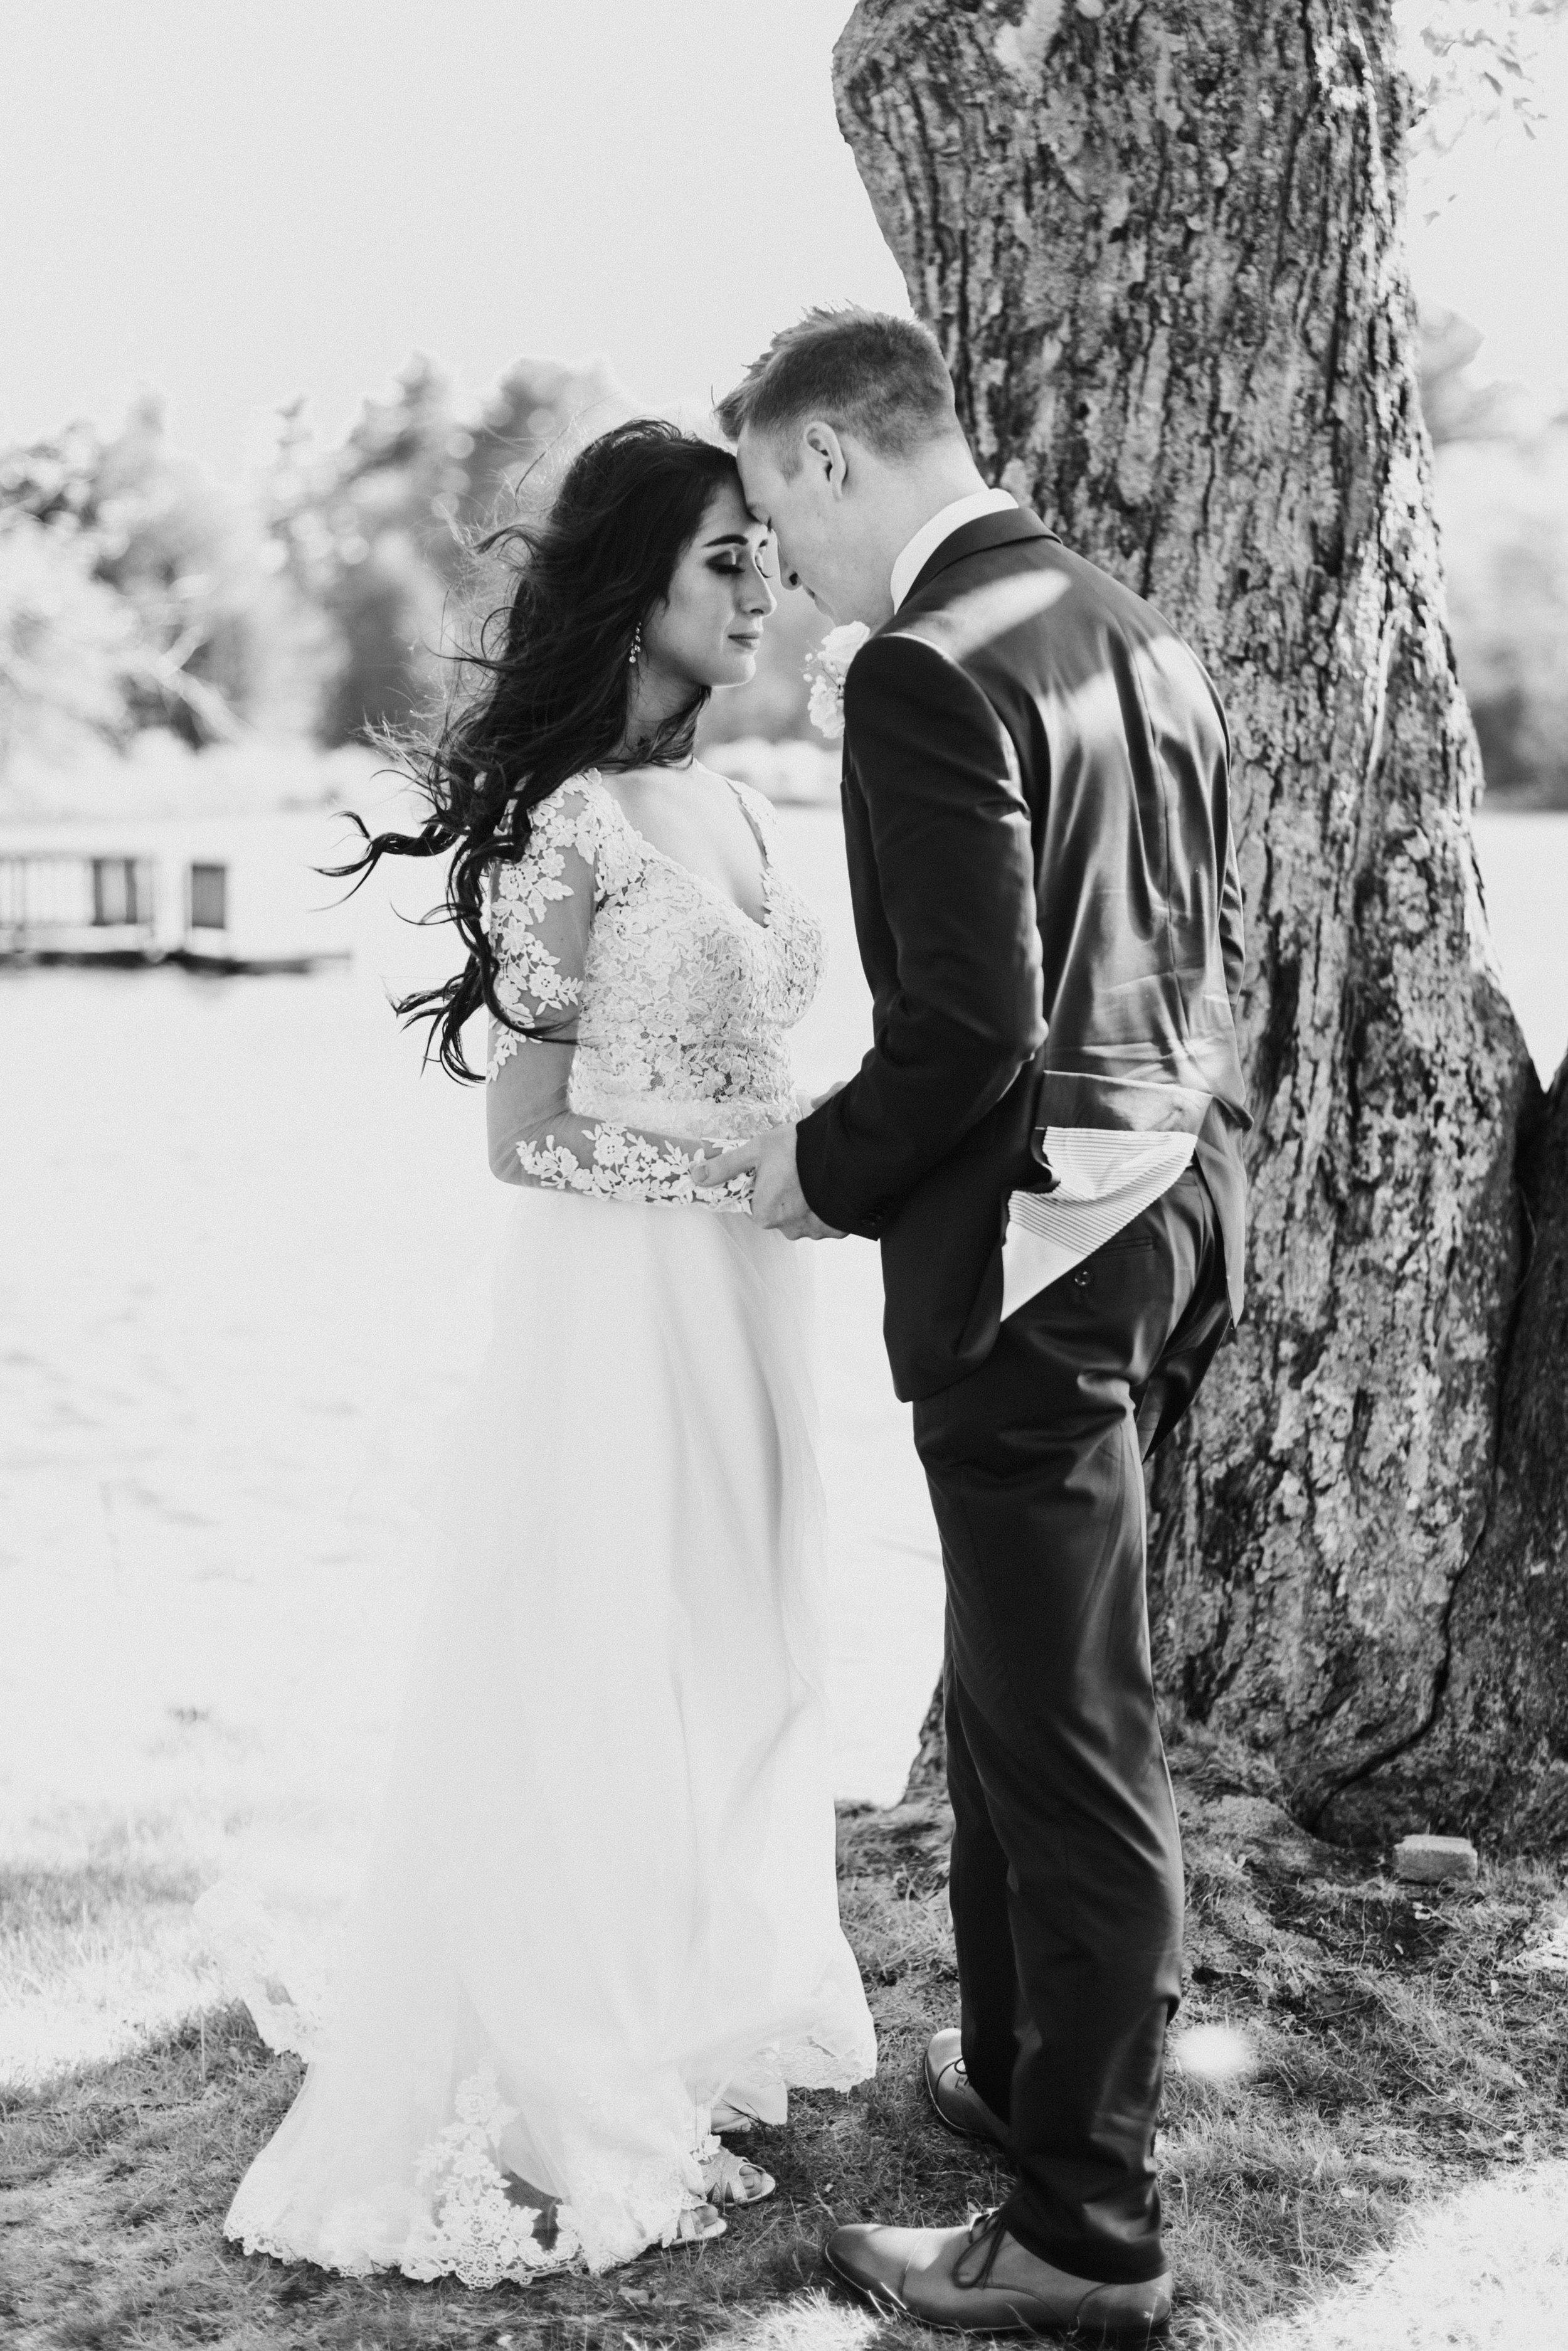 Barch-Massachusetts-Lakeside Tent Wedding-Western Massachusetts Wedding Photographer-01708.jpg